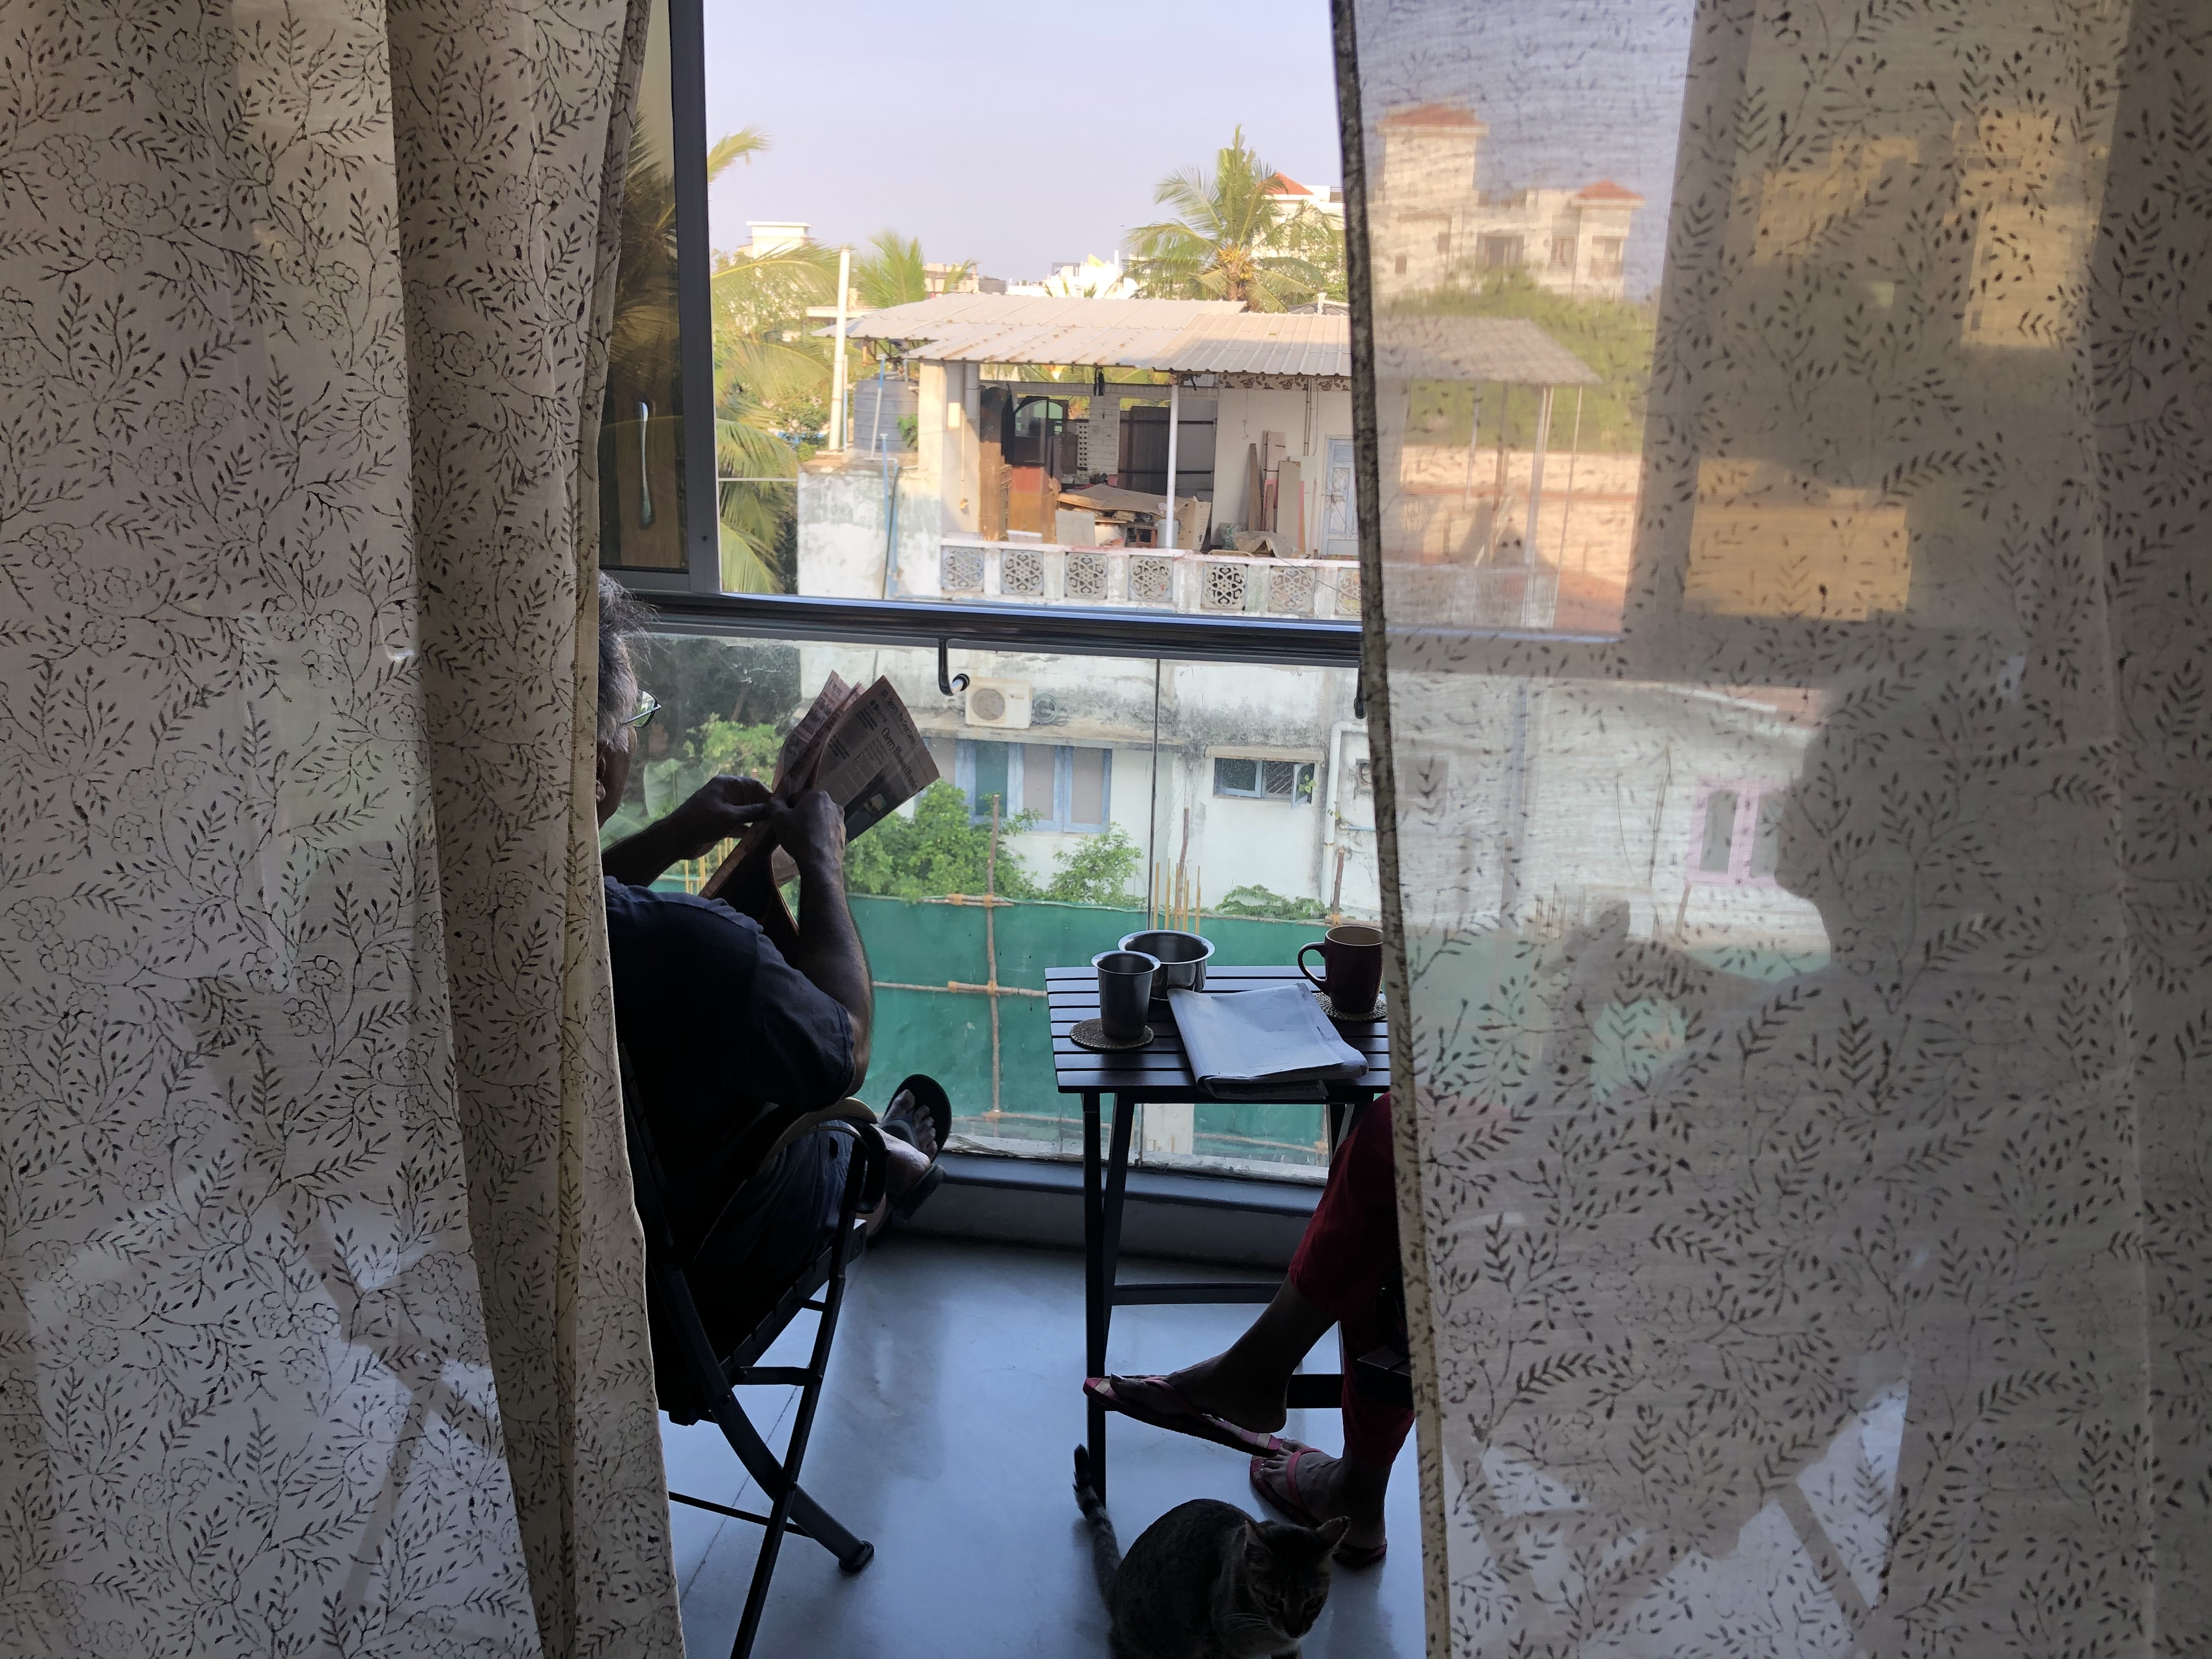 A view from Shrishti Mathew's balcony in India.